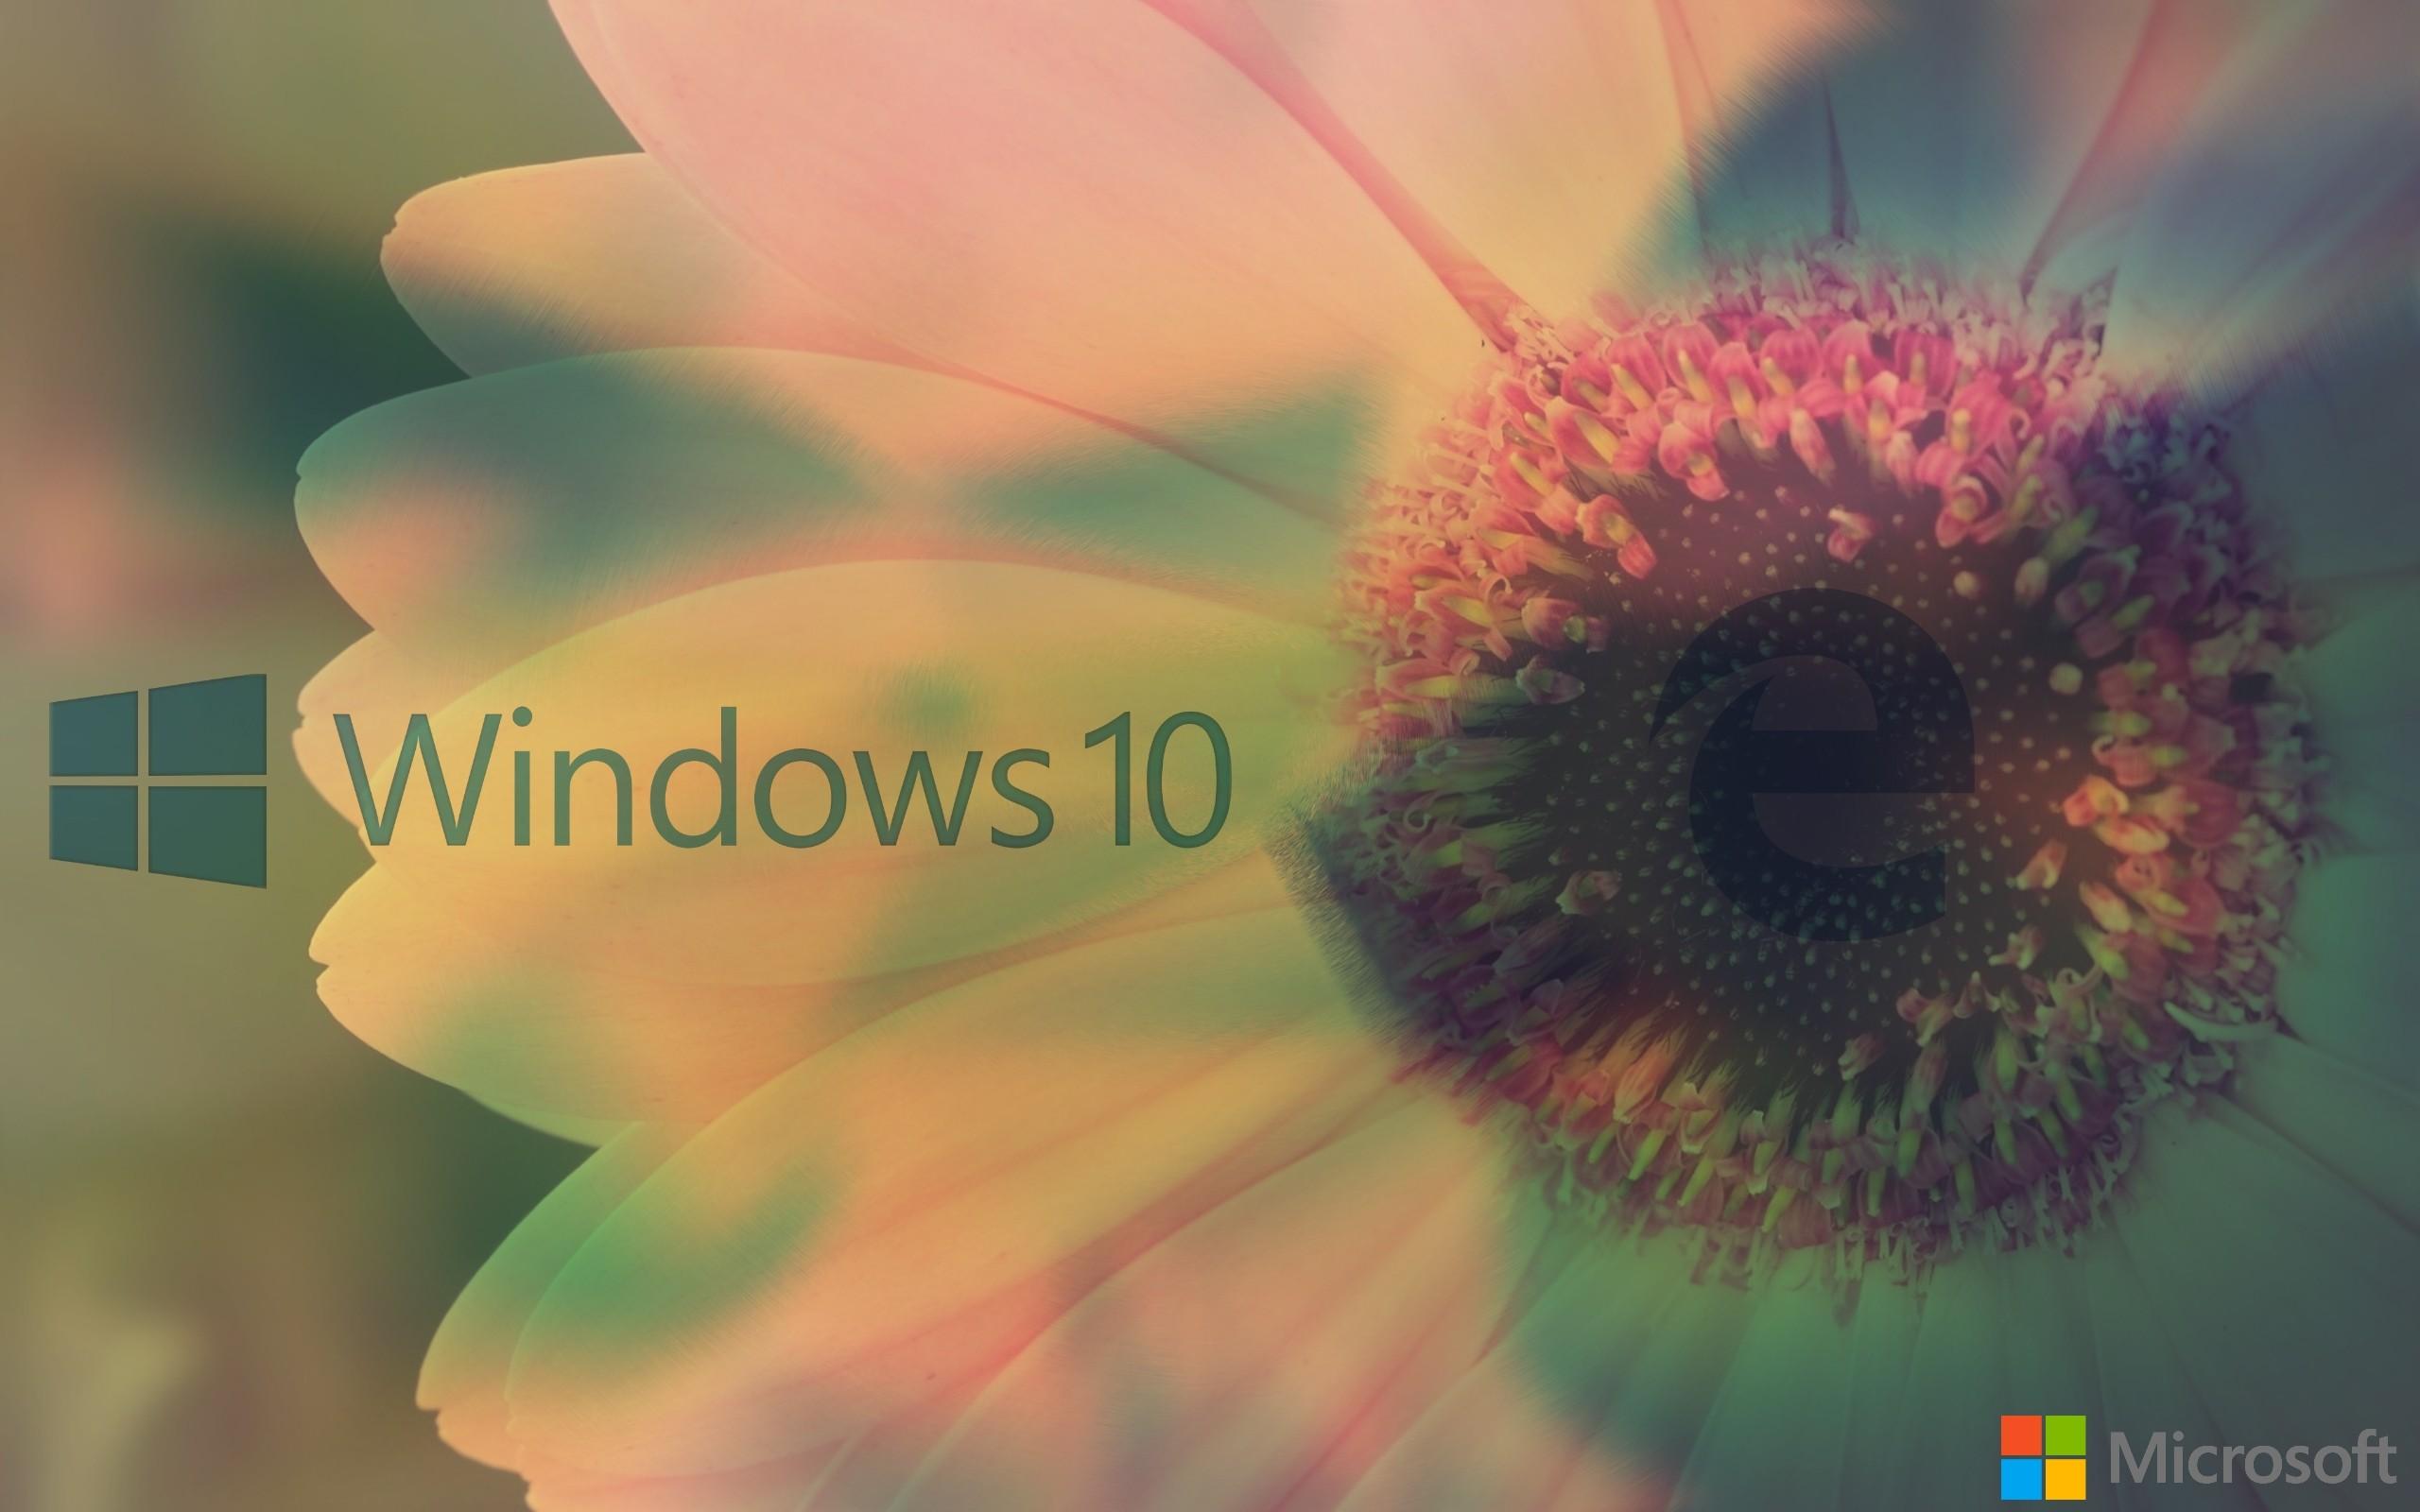 General 2560x1600 window Microsoft Windows Windows 10 MS-DOS Windows XP Windows Vista operating system